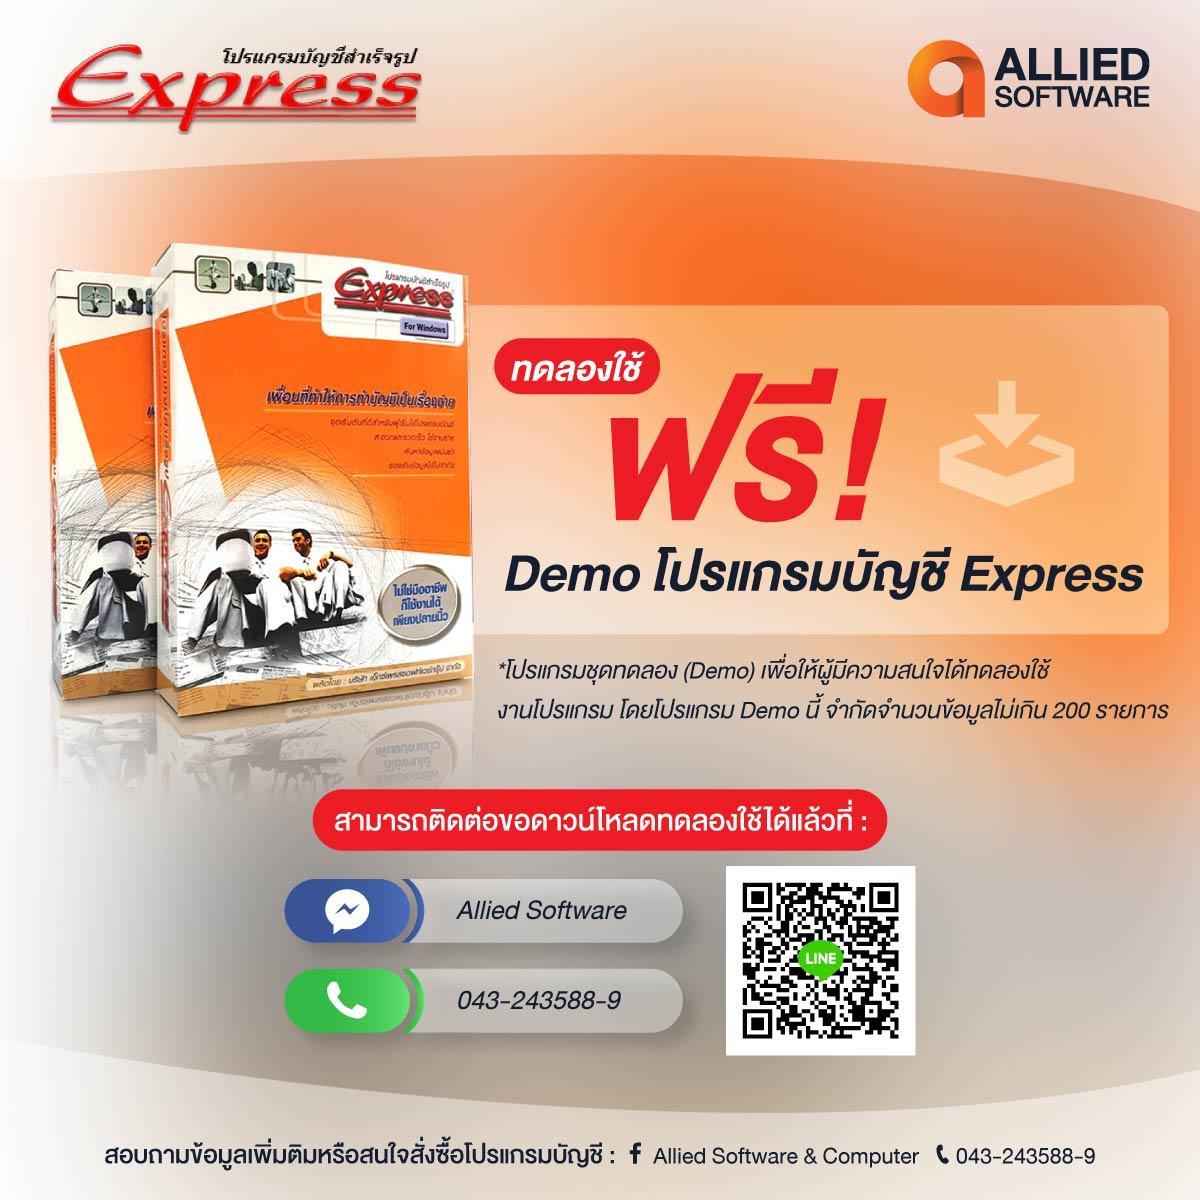 Demo โปรแกรมบัญชี Express